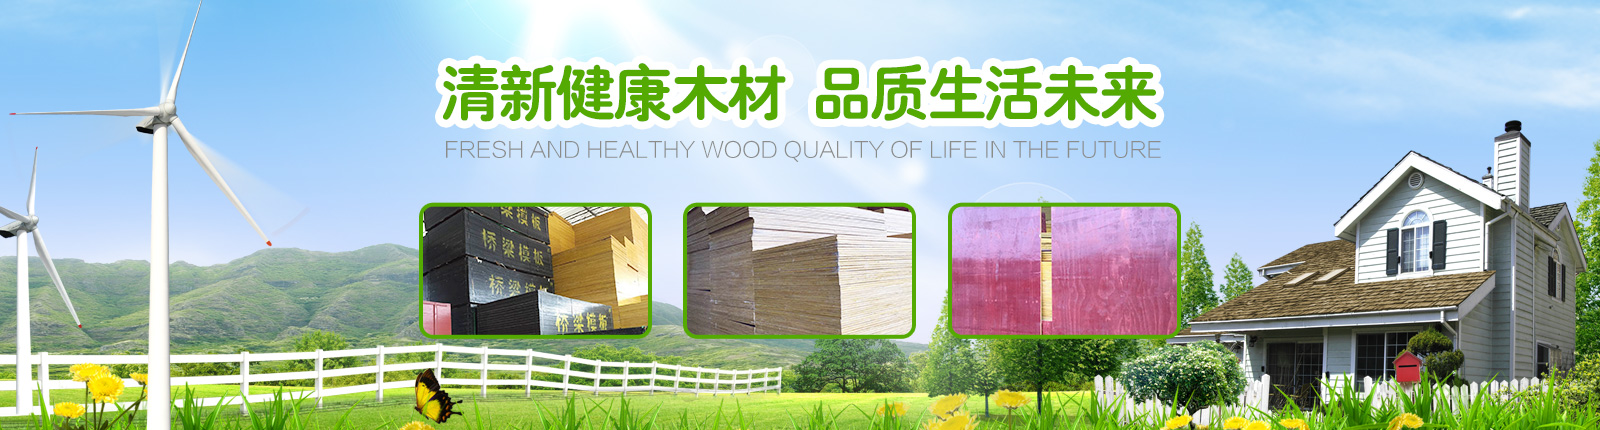 重庆木材加工